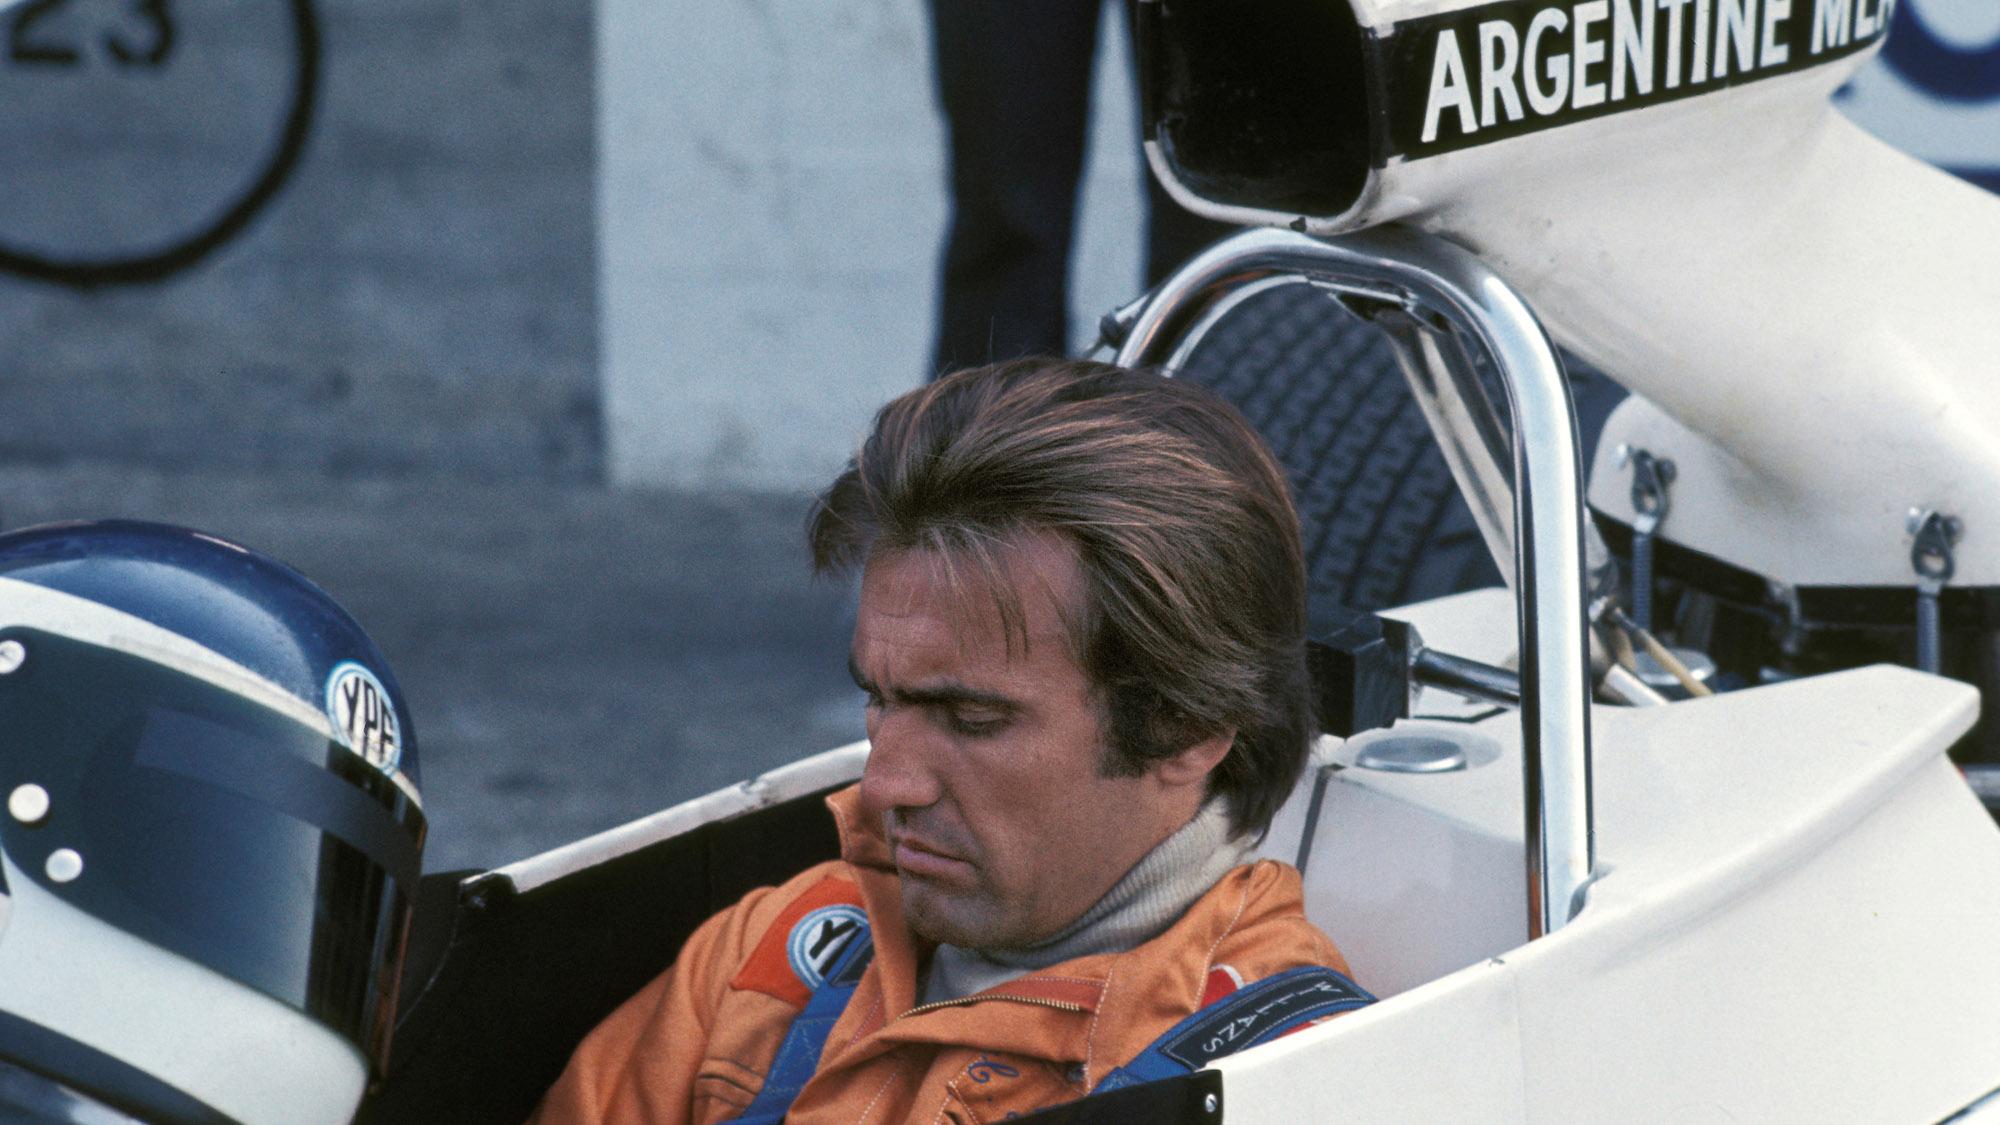 Carlos Reutemann in his Brabham ford in 1972